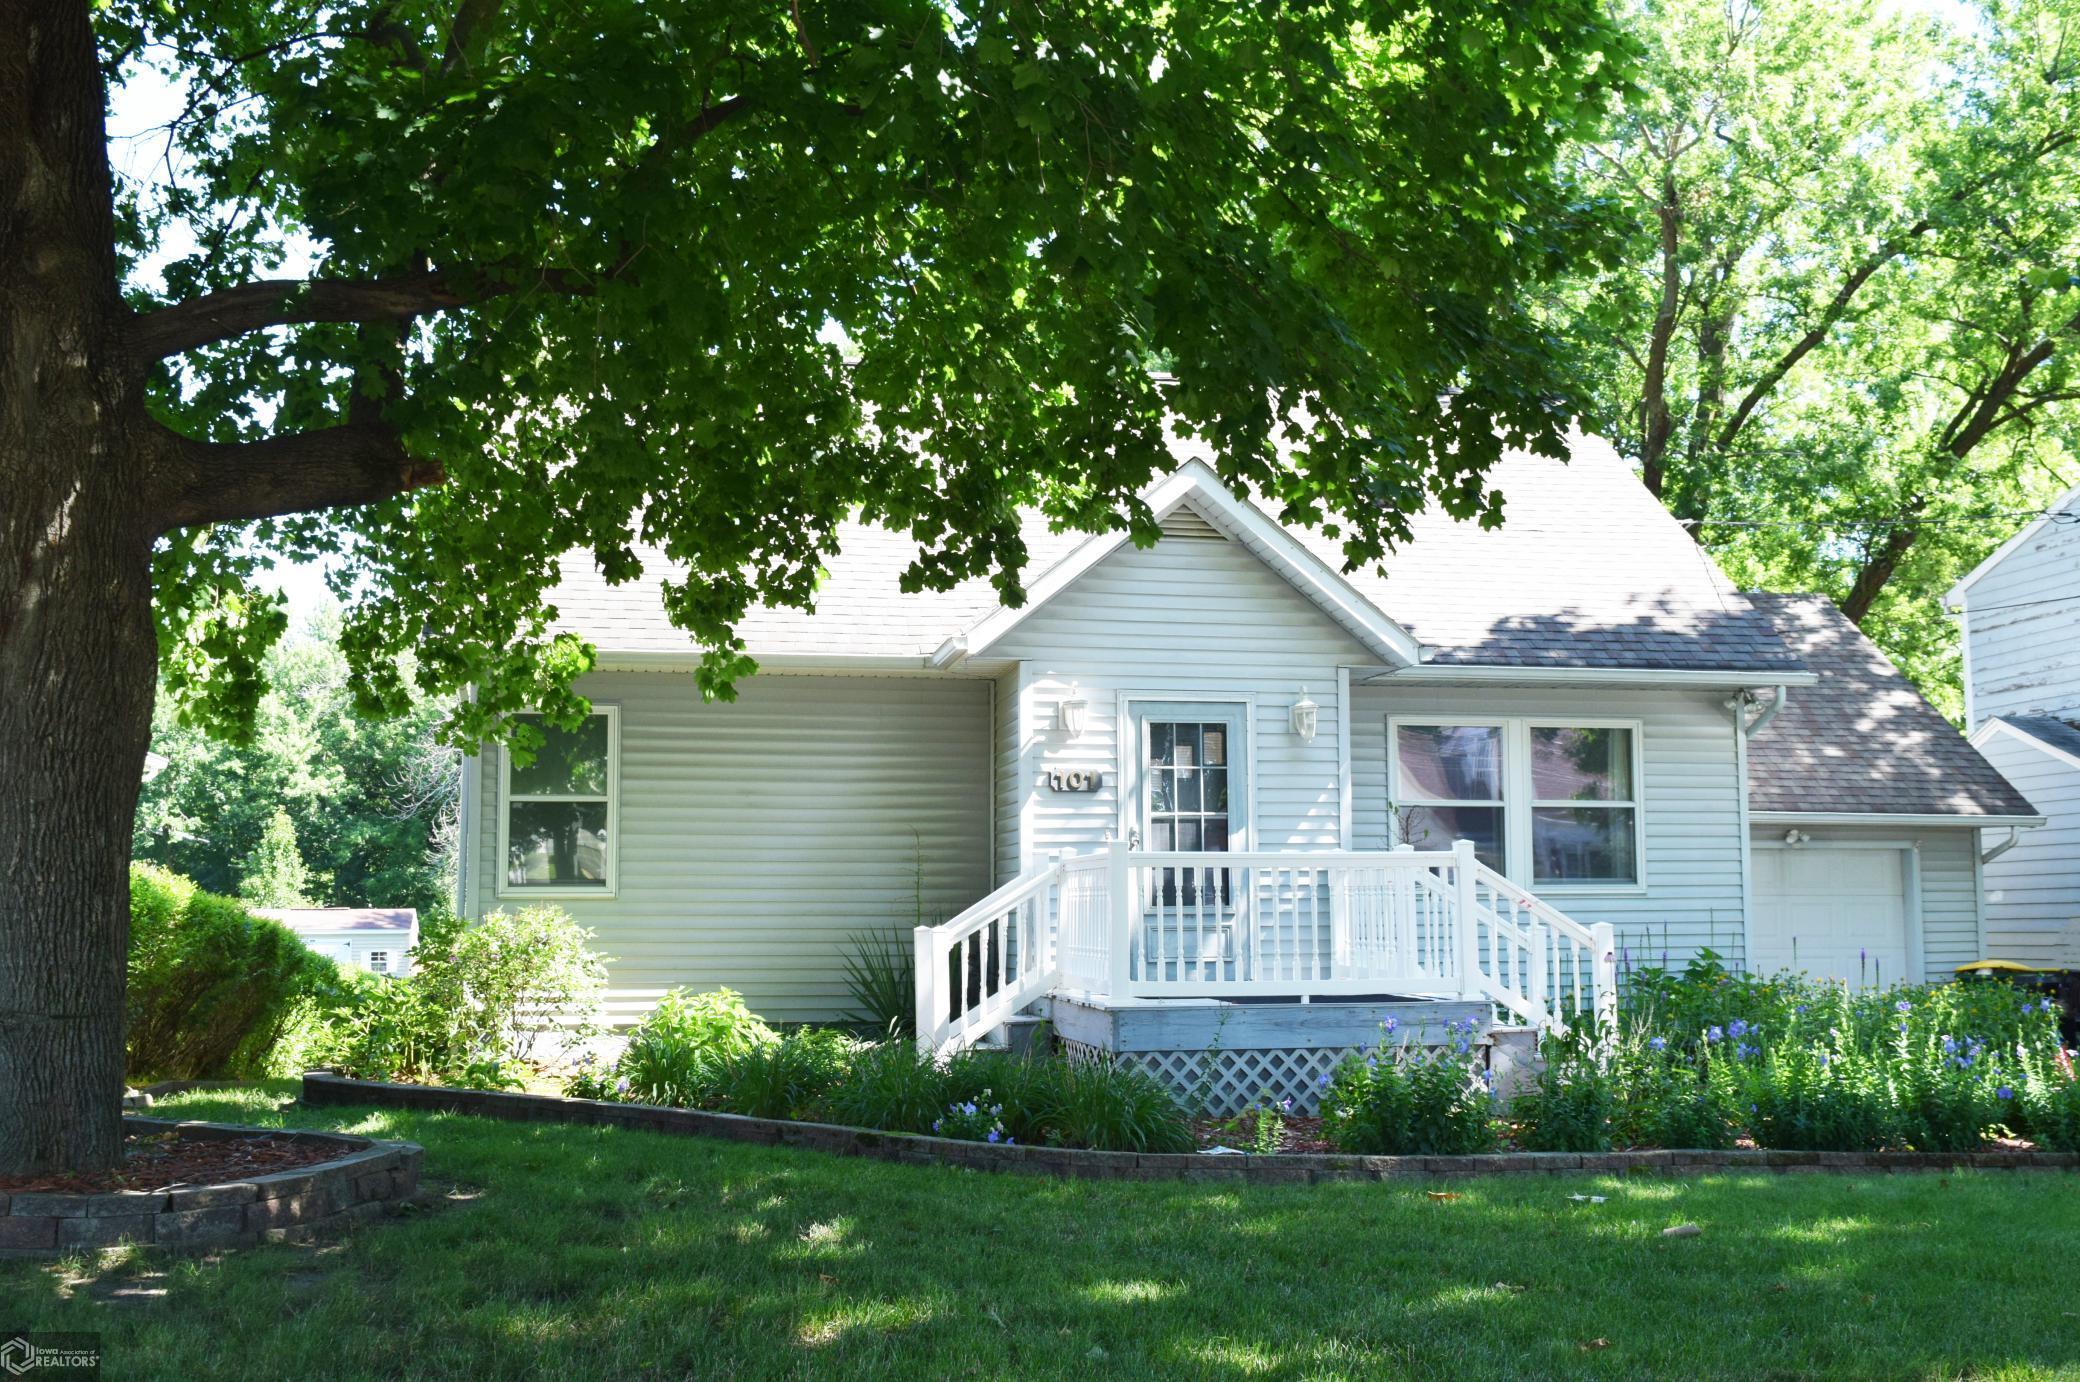 101 Wilson Property Photo - Fairfield, IA real estate listing